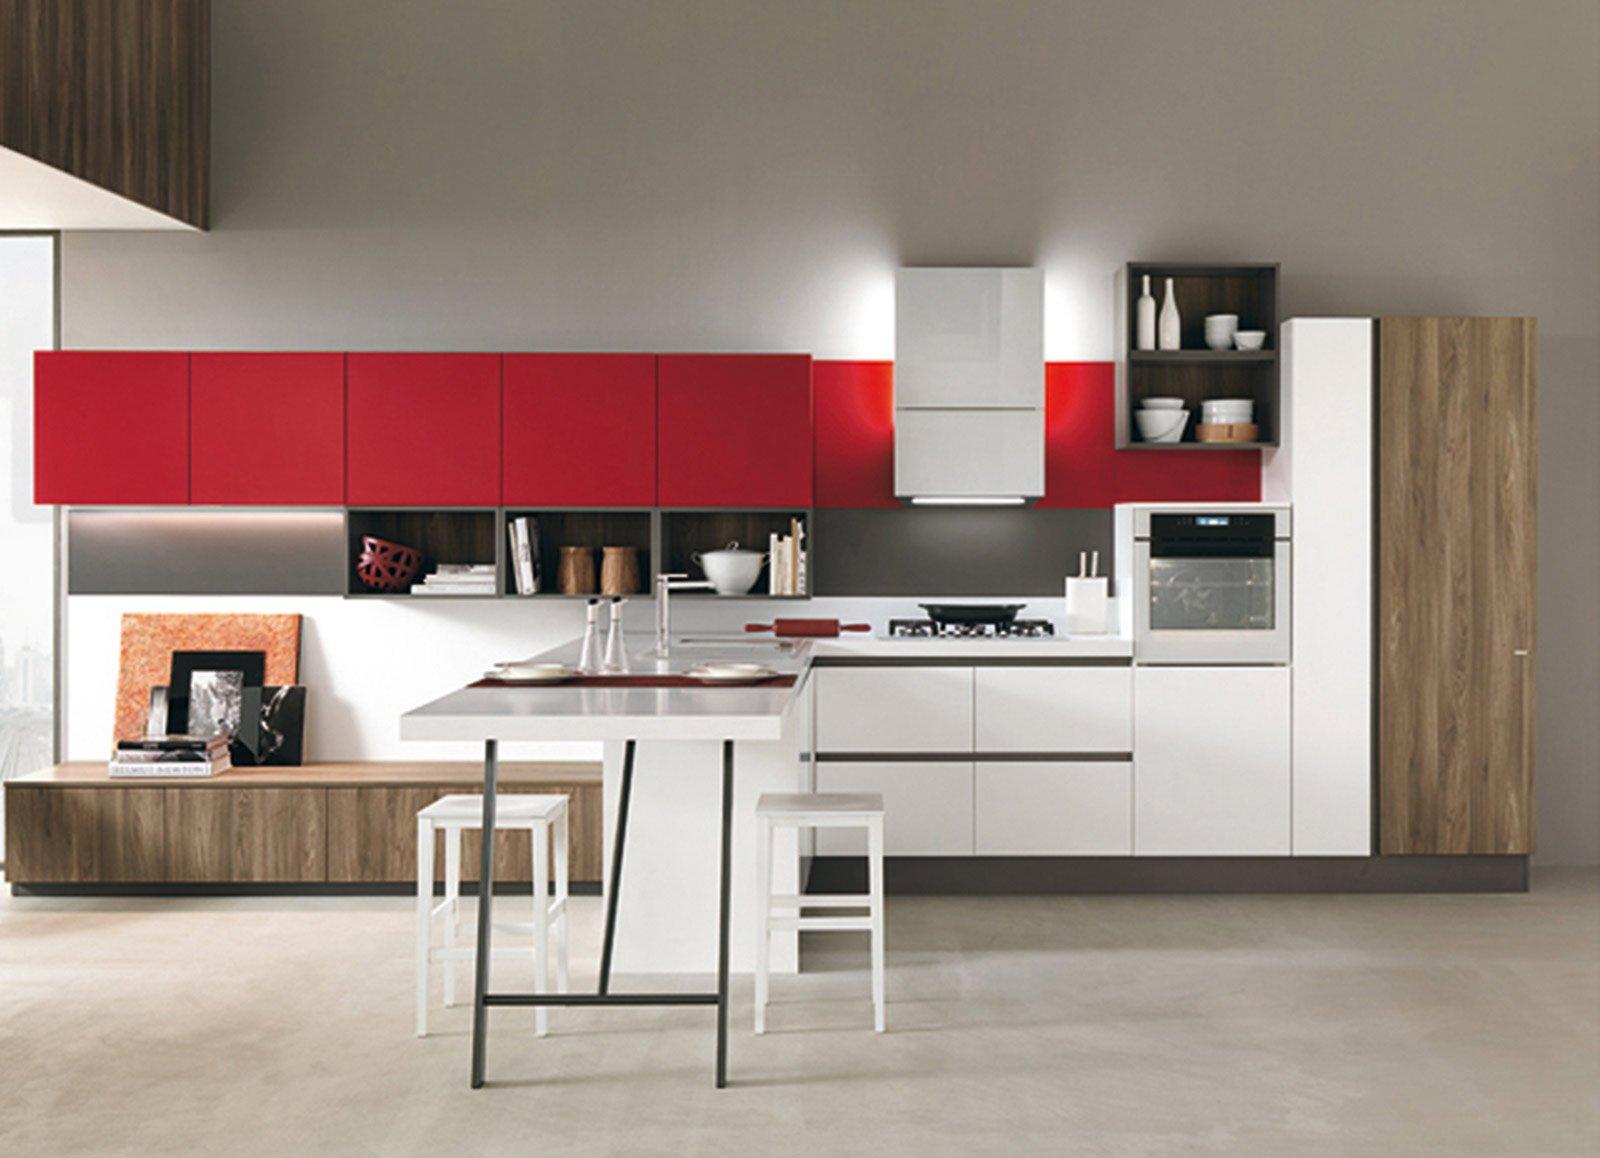 Cucina bianca e verde: cucina ante vetro verde e mdf bianco,piano ...